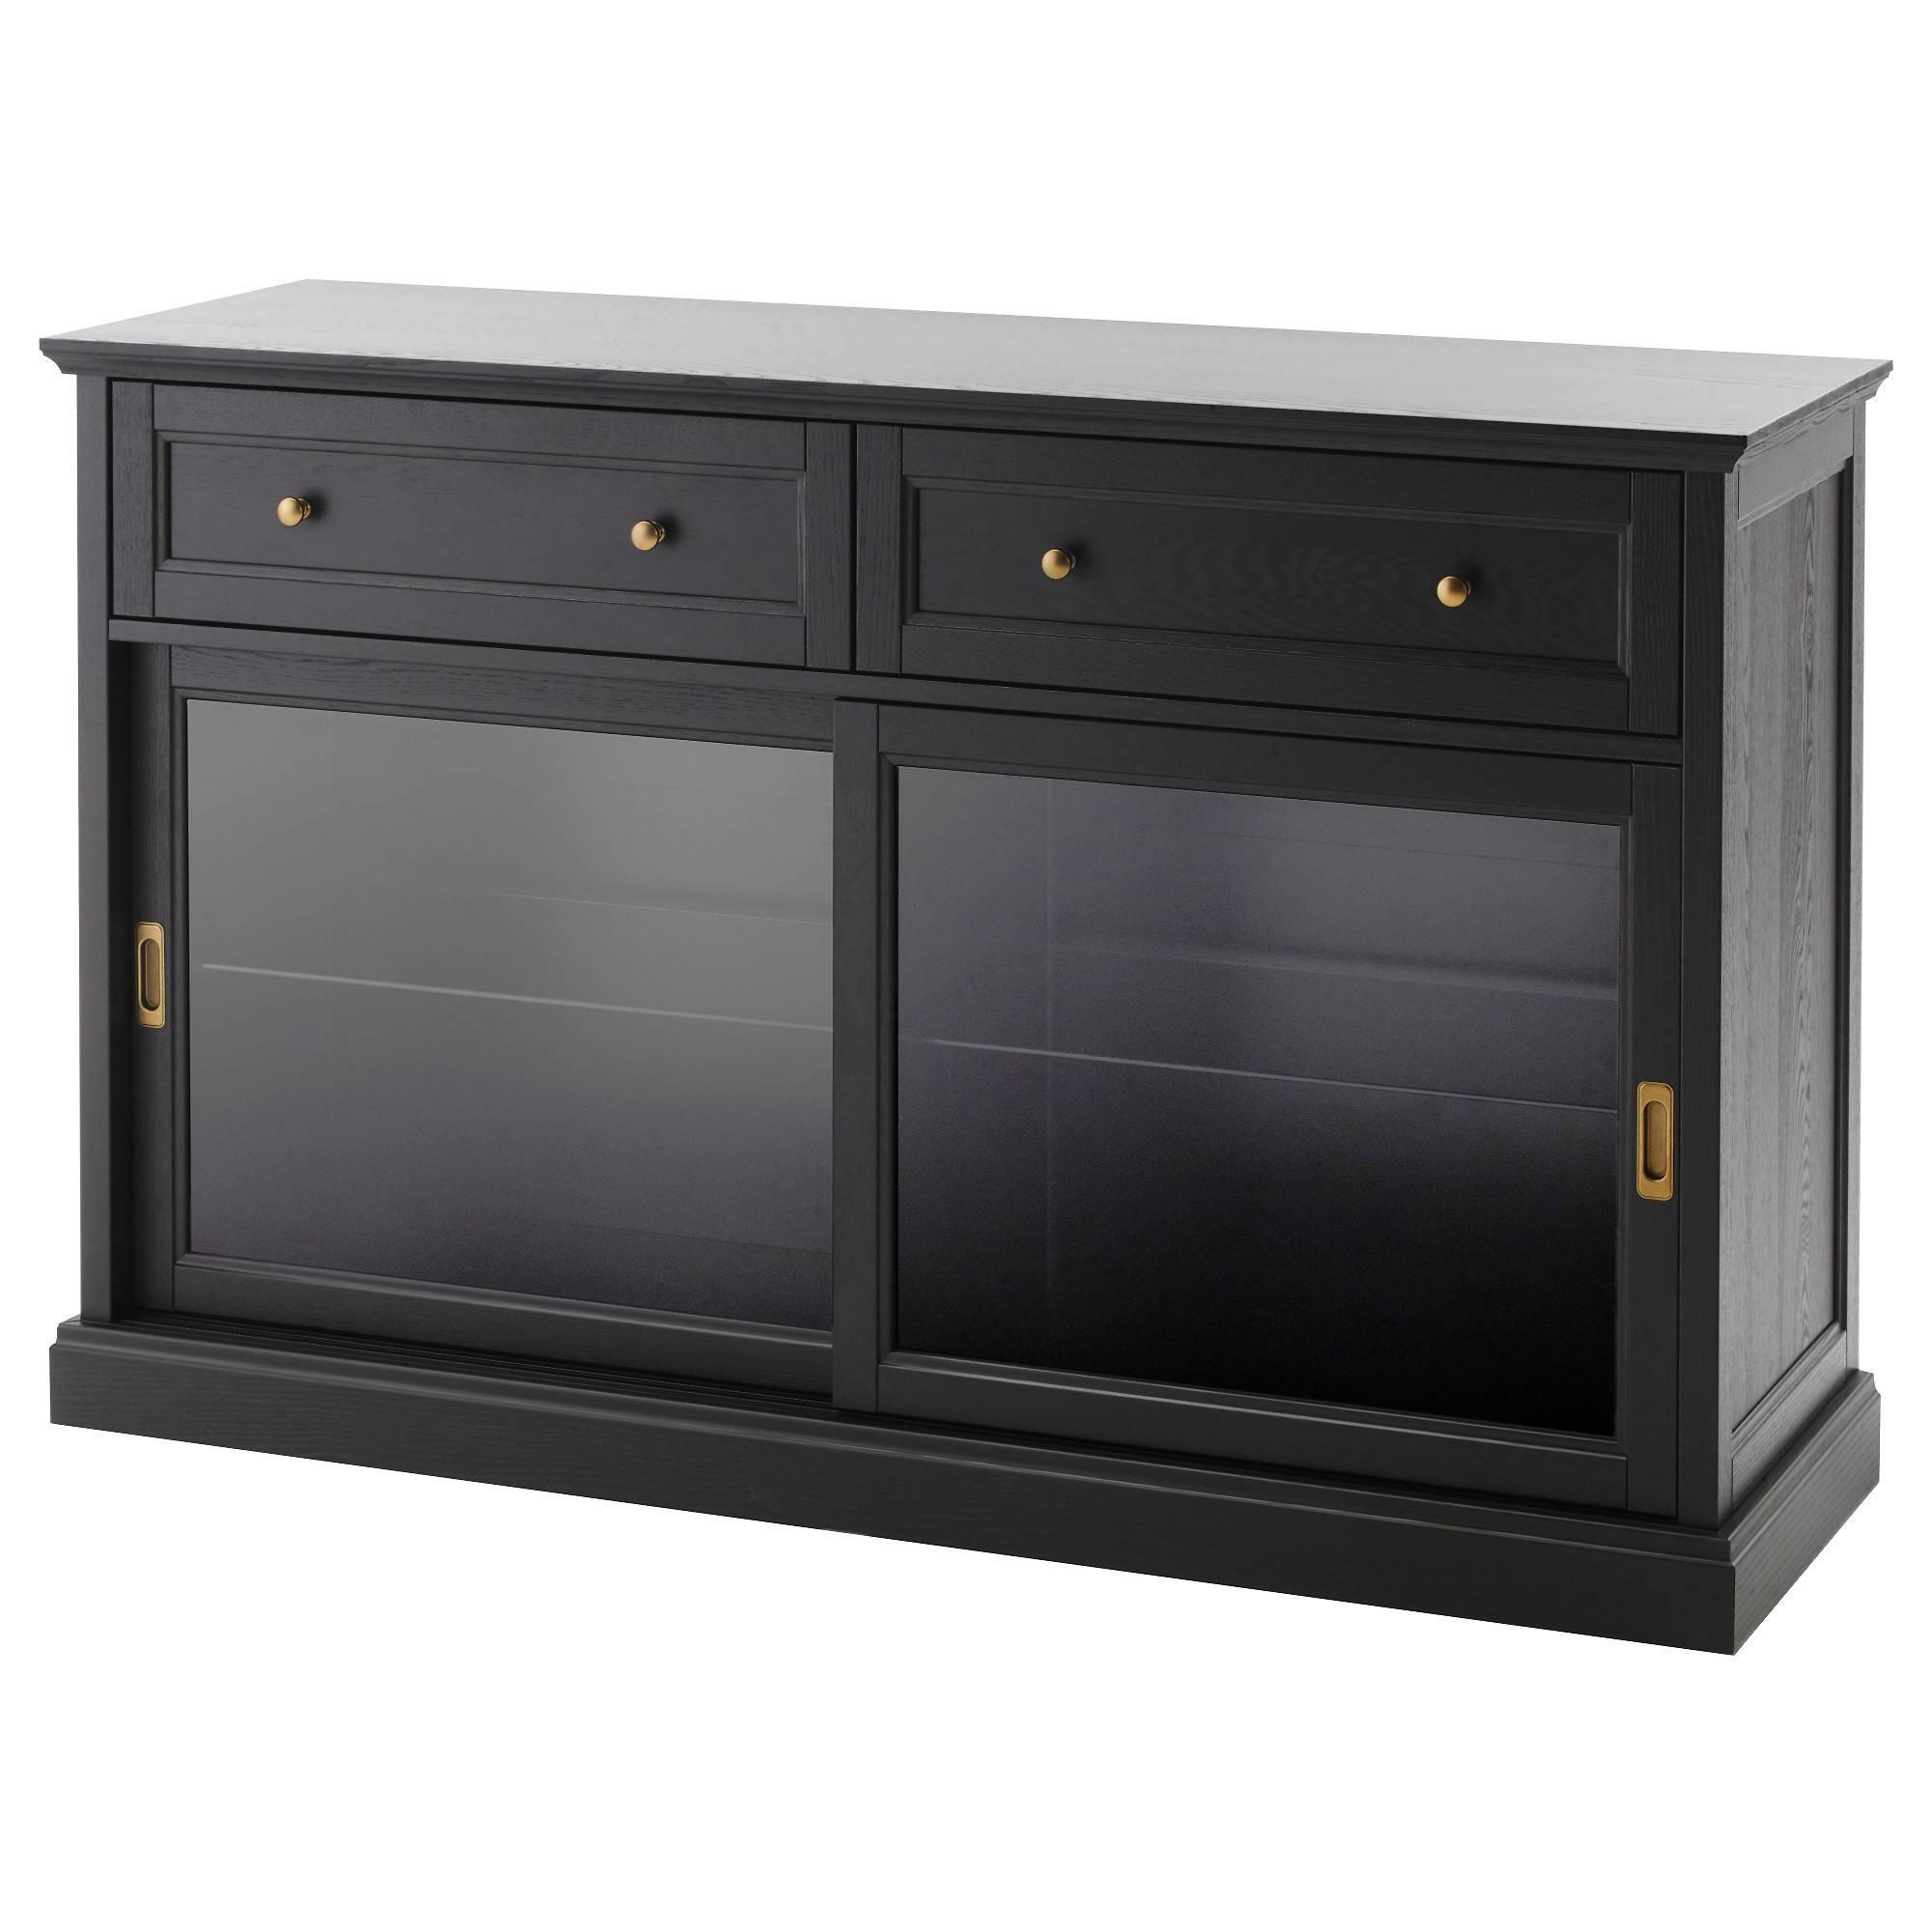 Buffet Tables & Sideboards - Ikea inside Dark Sideboards Furniture (Image 6 of 30)